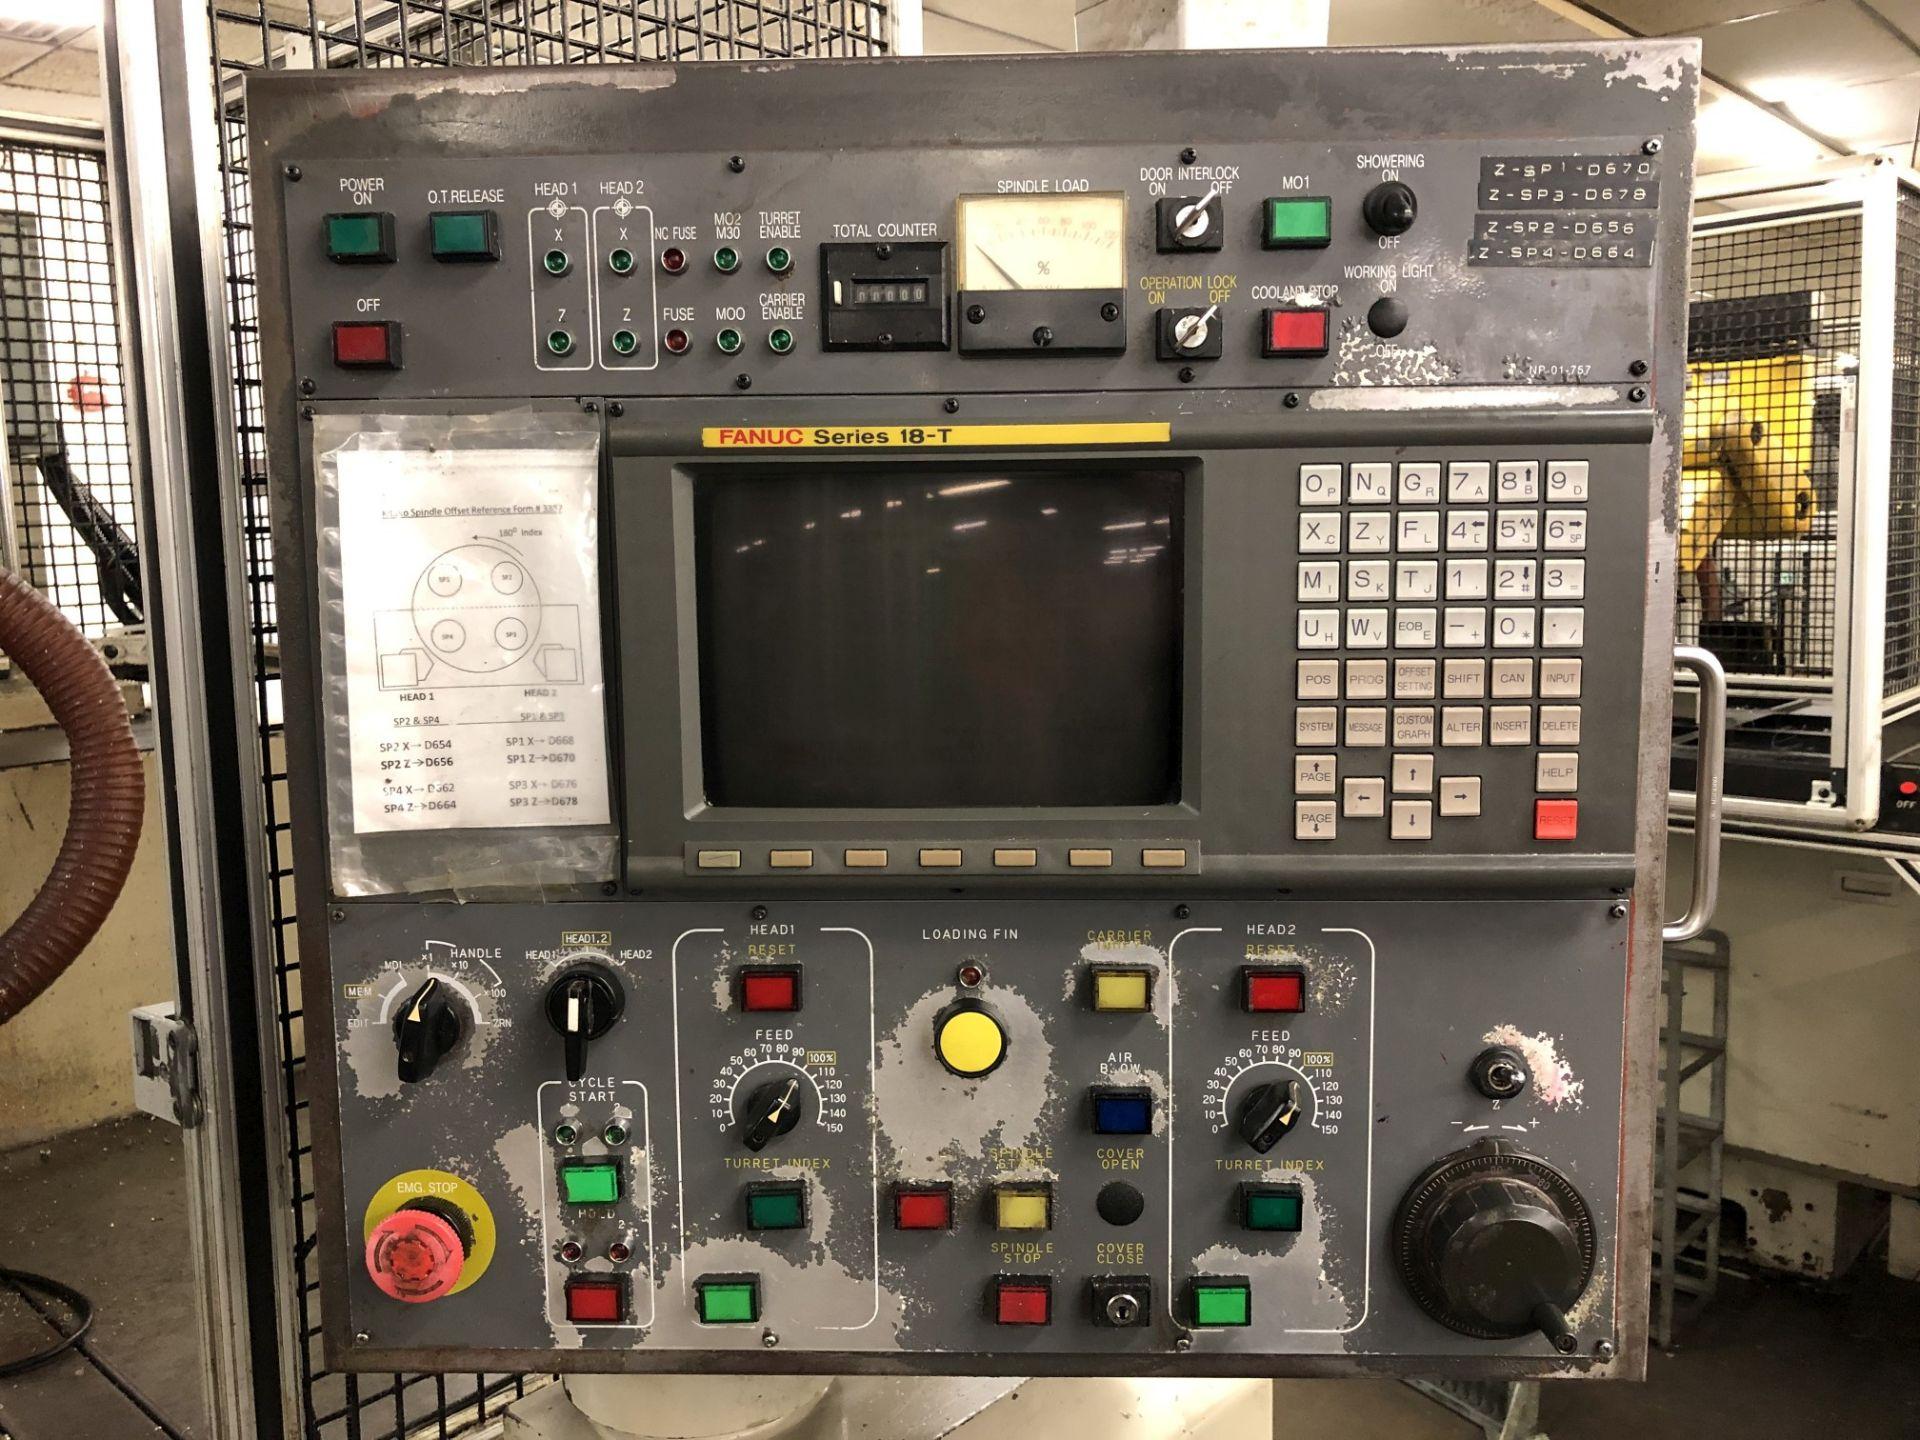 1999 Kitako MT4-200 Multi-Spindle CNC Turning Mill - Image 5 of 16